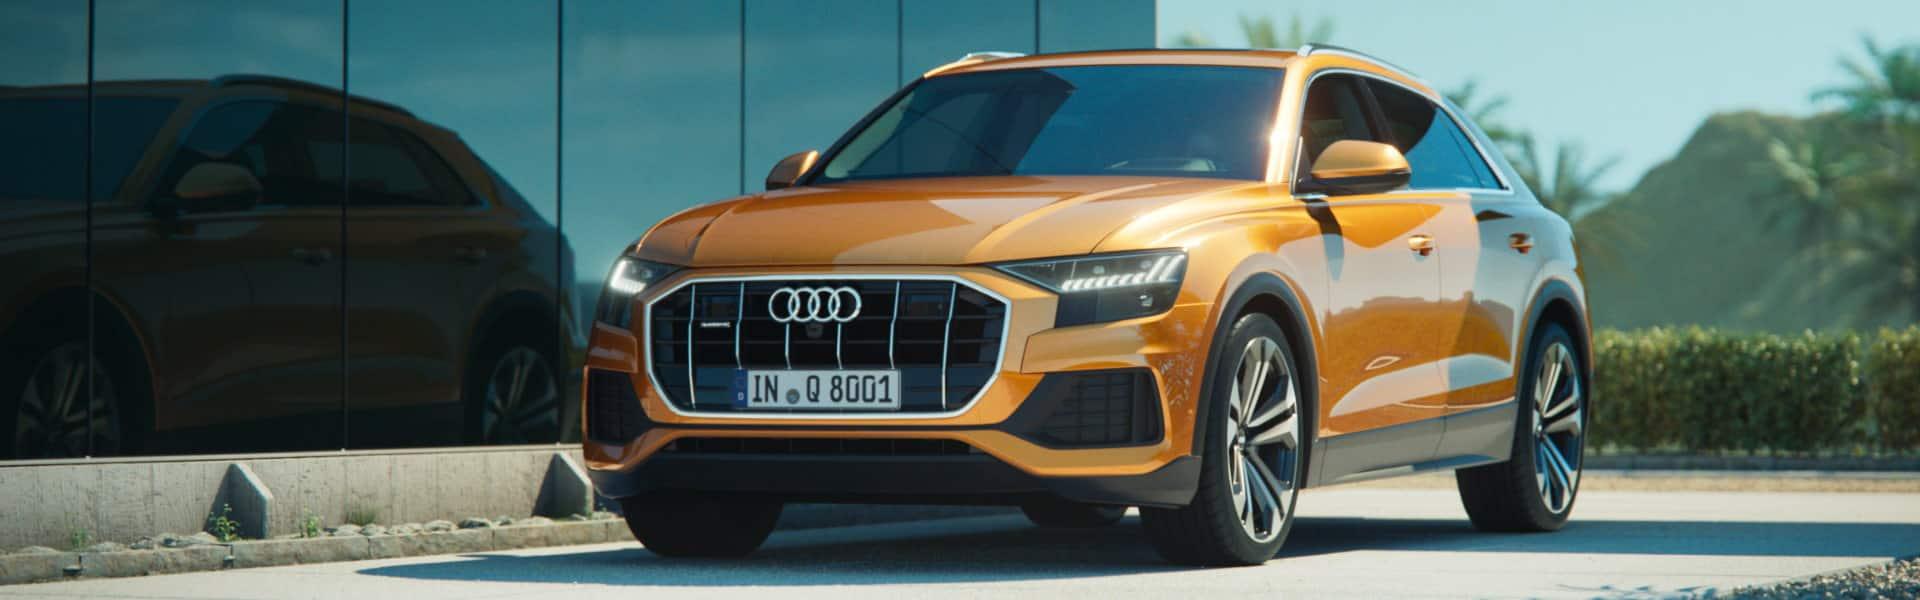 Nowe Audi Q8